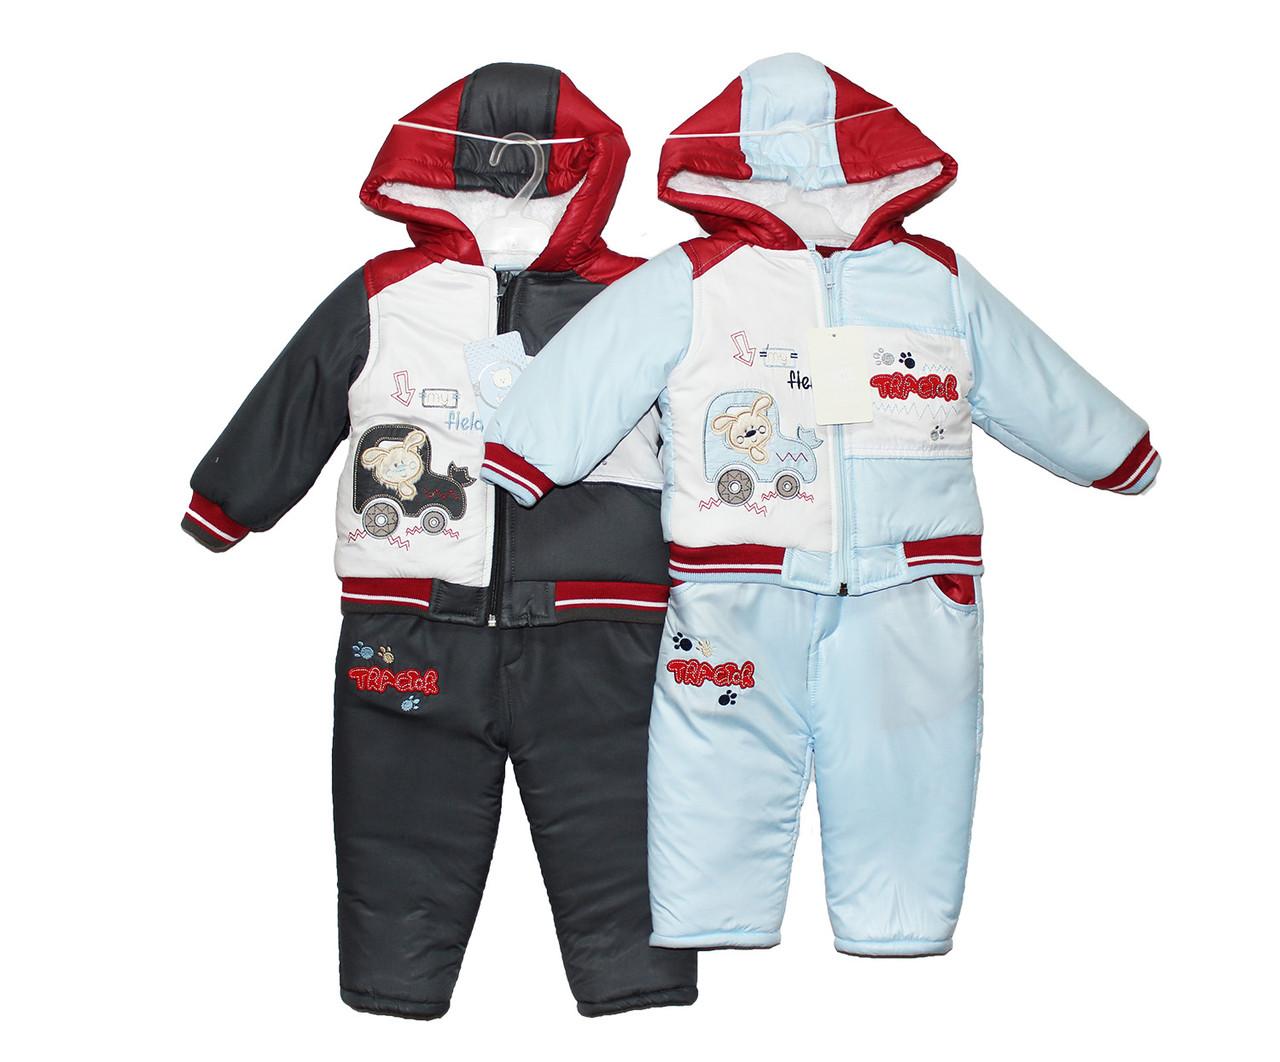 Комбинезон детский зимний для мальчика Picomini 1462